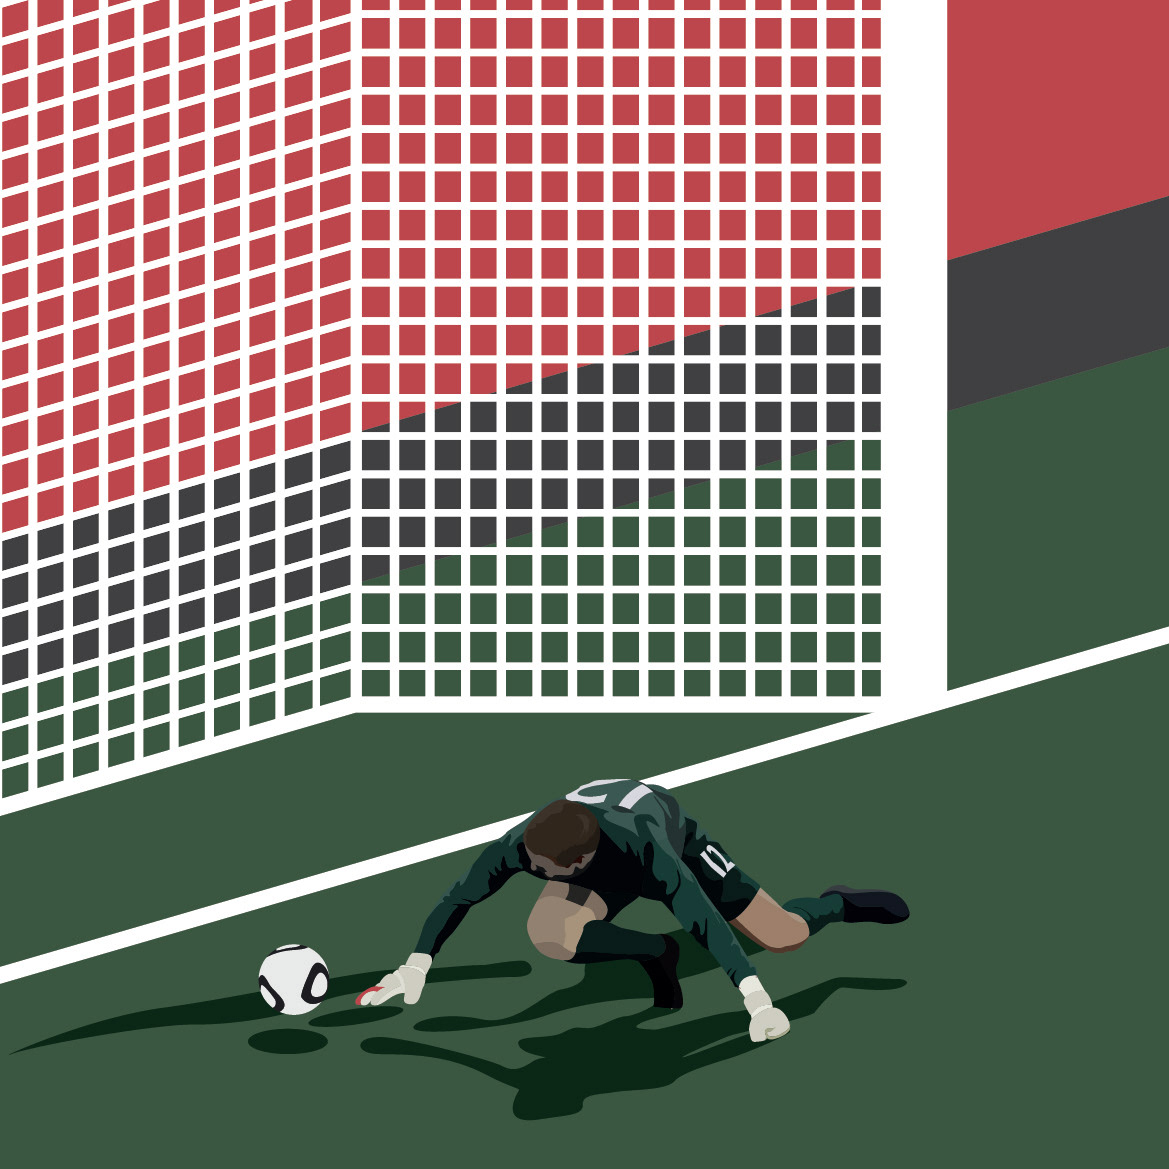 Ben Hasking - Design & Illustration - WEIRD WORLD CUP